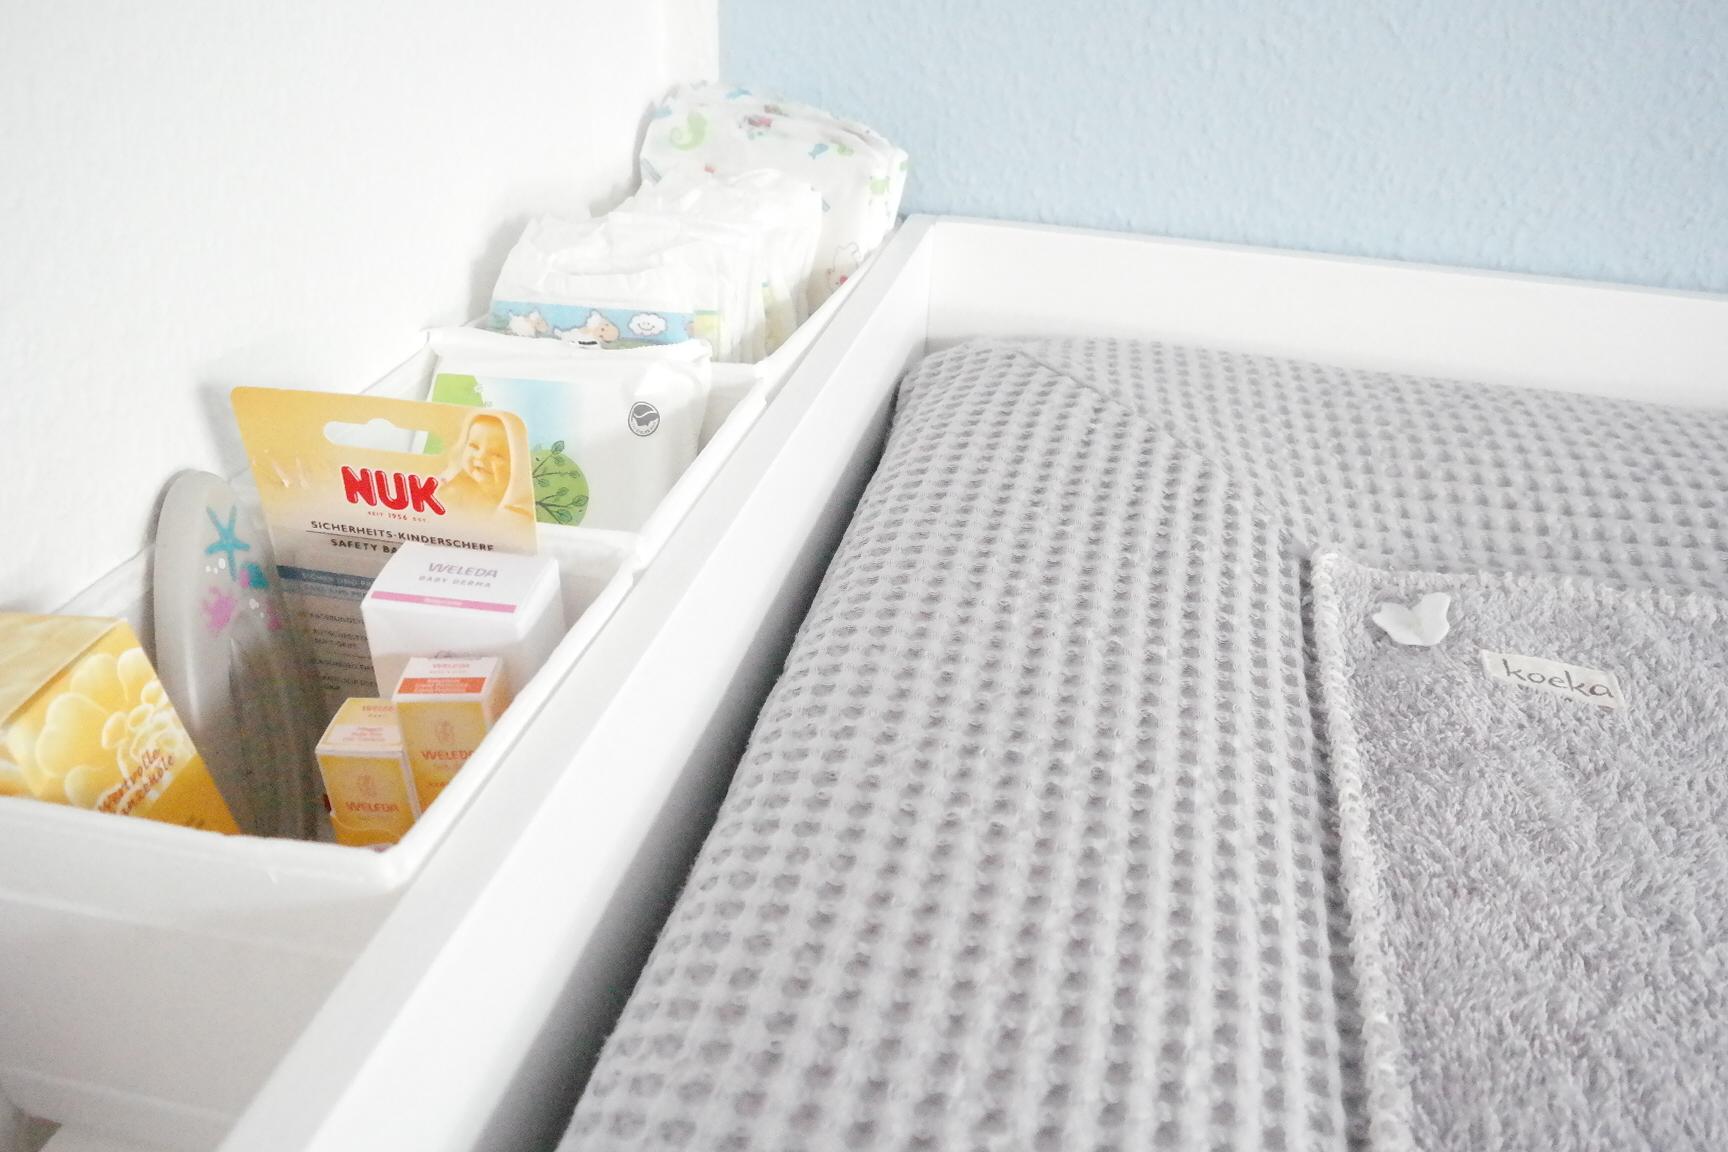 meine babybb zieht ein shopping liste adventsgewinnspiel missbonn e bonn e. Black Bedroom Furniture Sets. Home Design Ideas